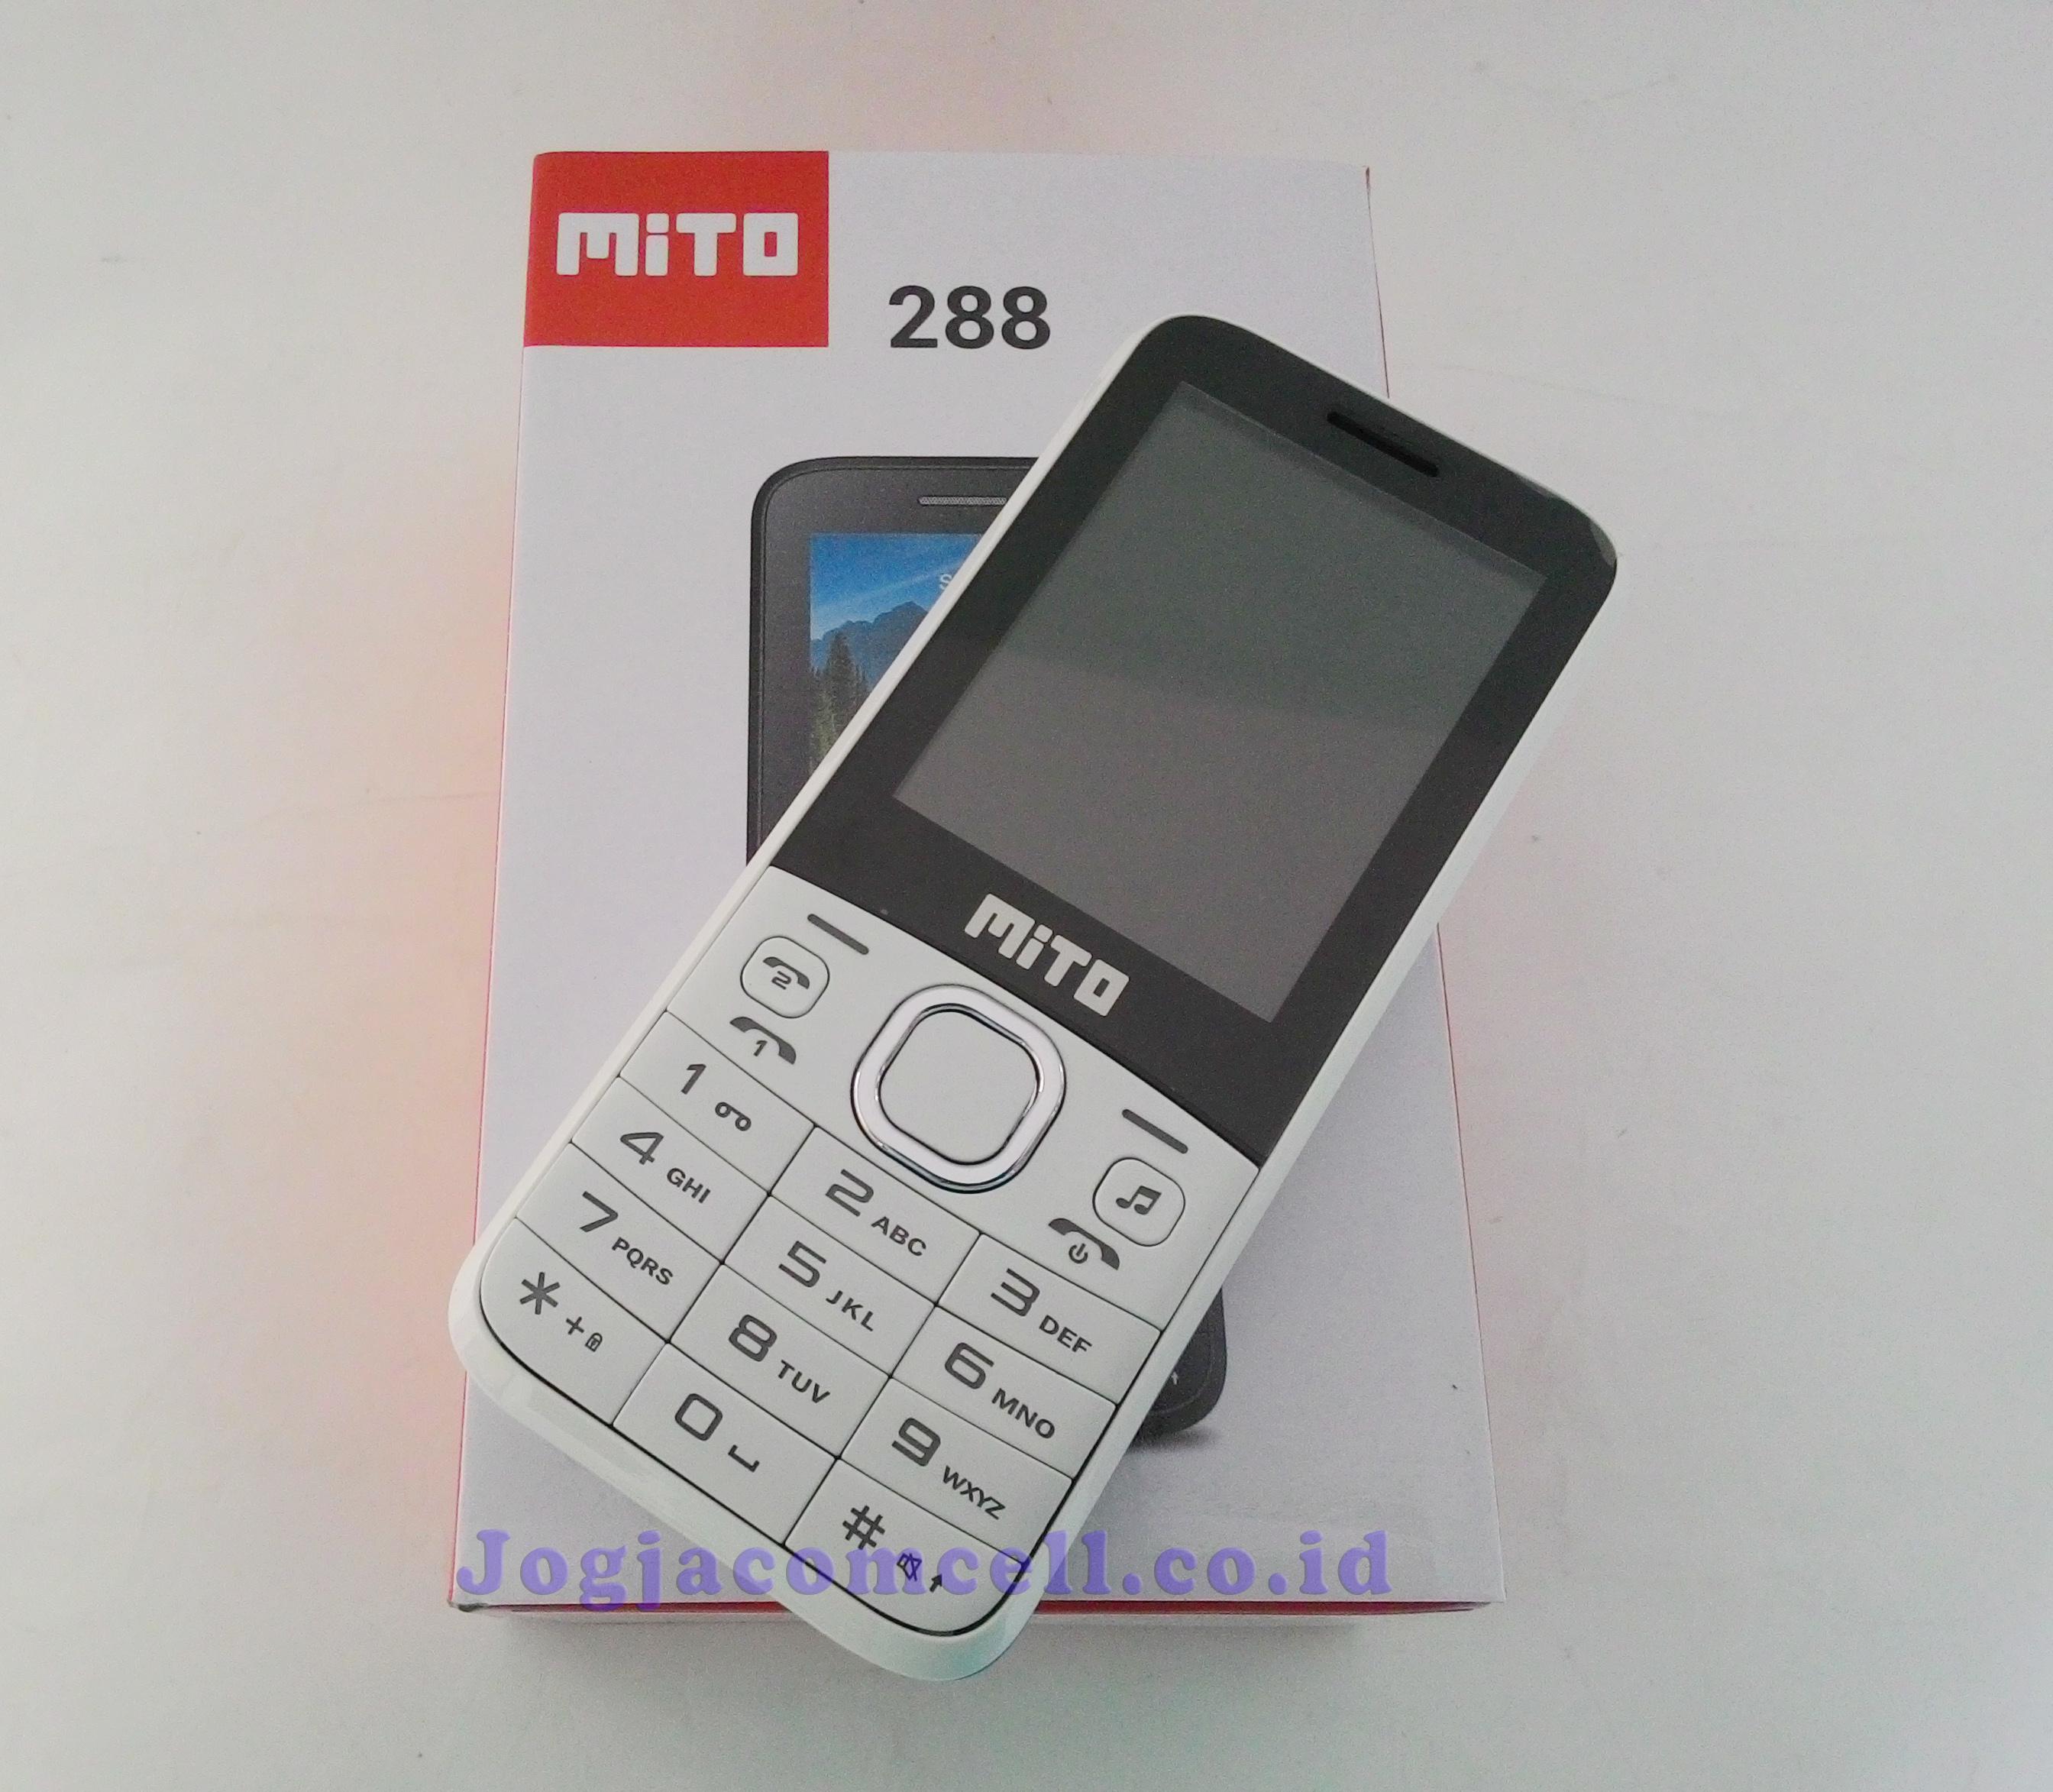 Mito 151 Handphone Dual Sim Garansi 1 Tahun Mirip Nokia 3310 by Jual Handphone